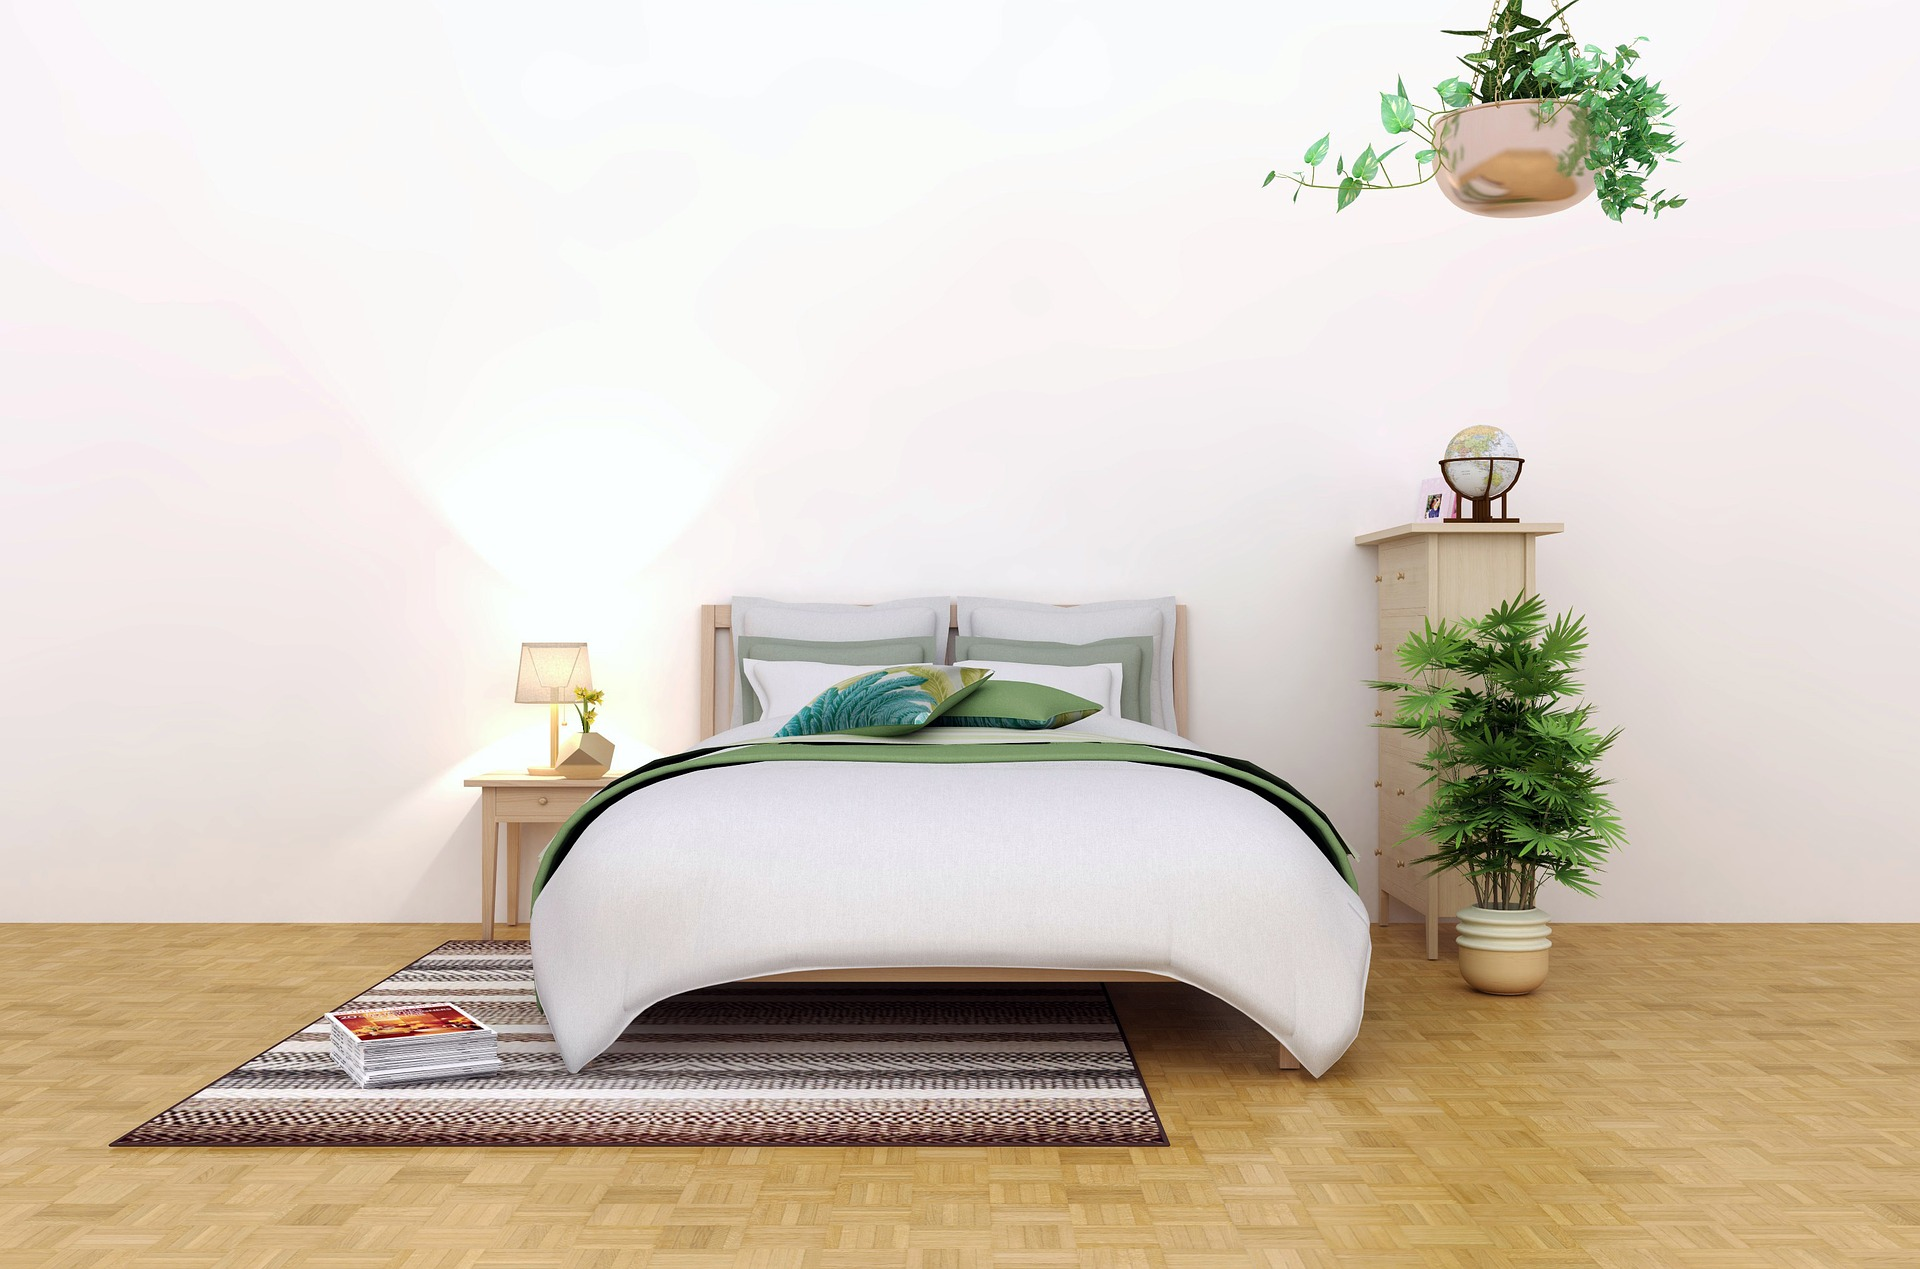 stof in je huis minimaliseren